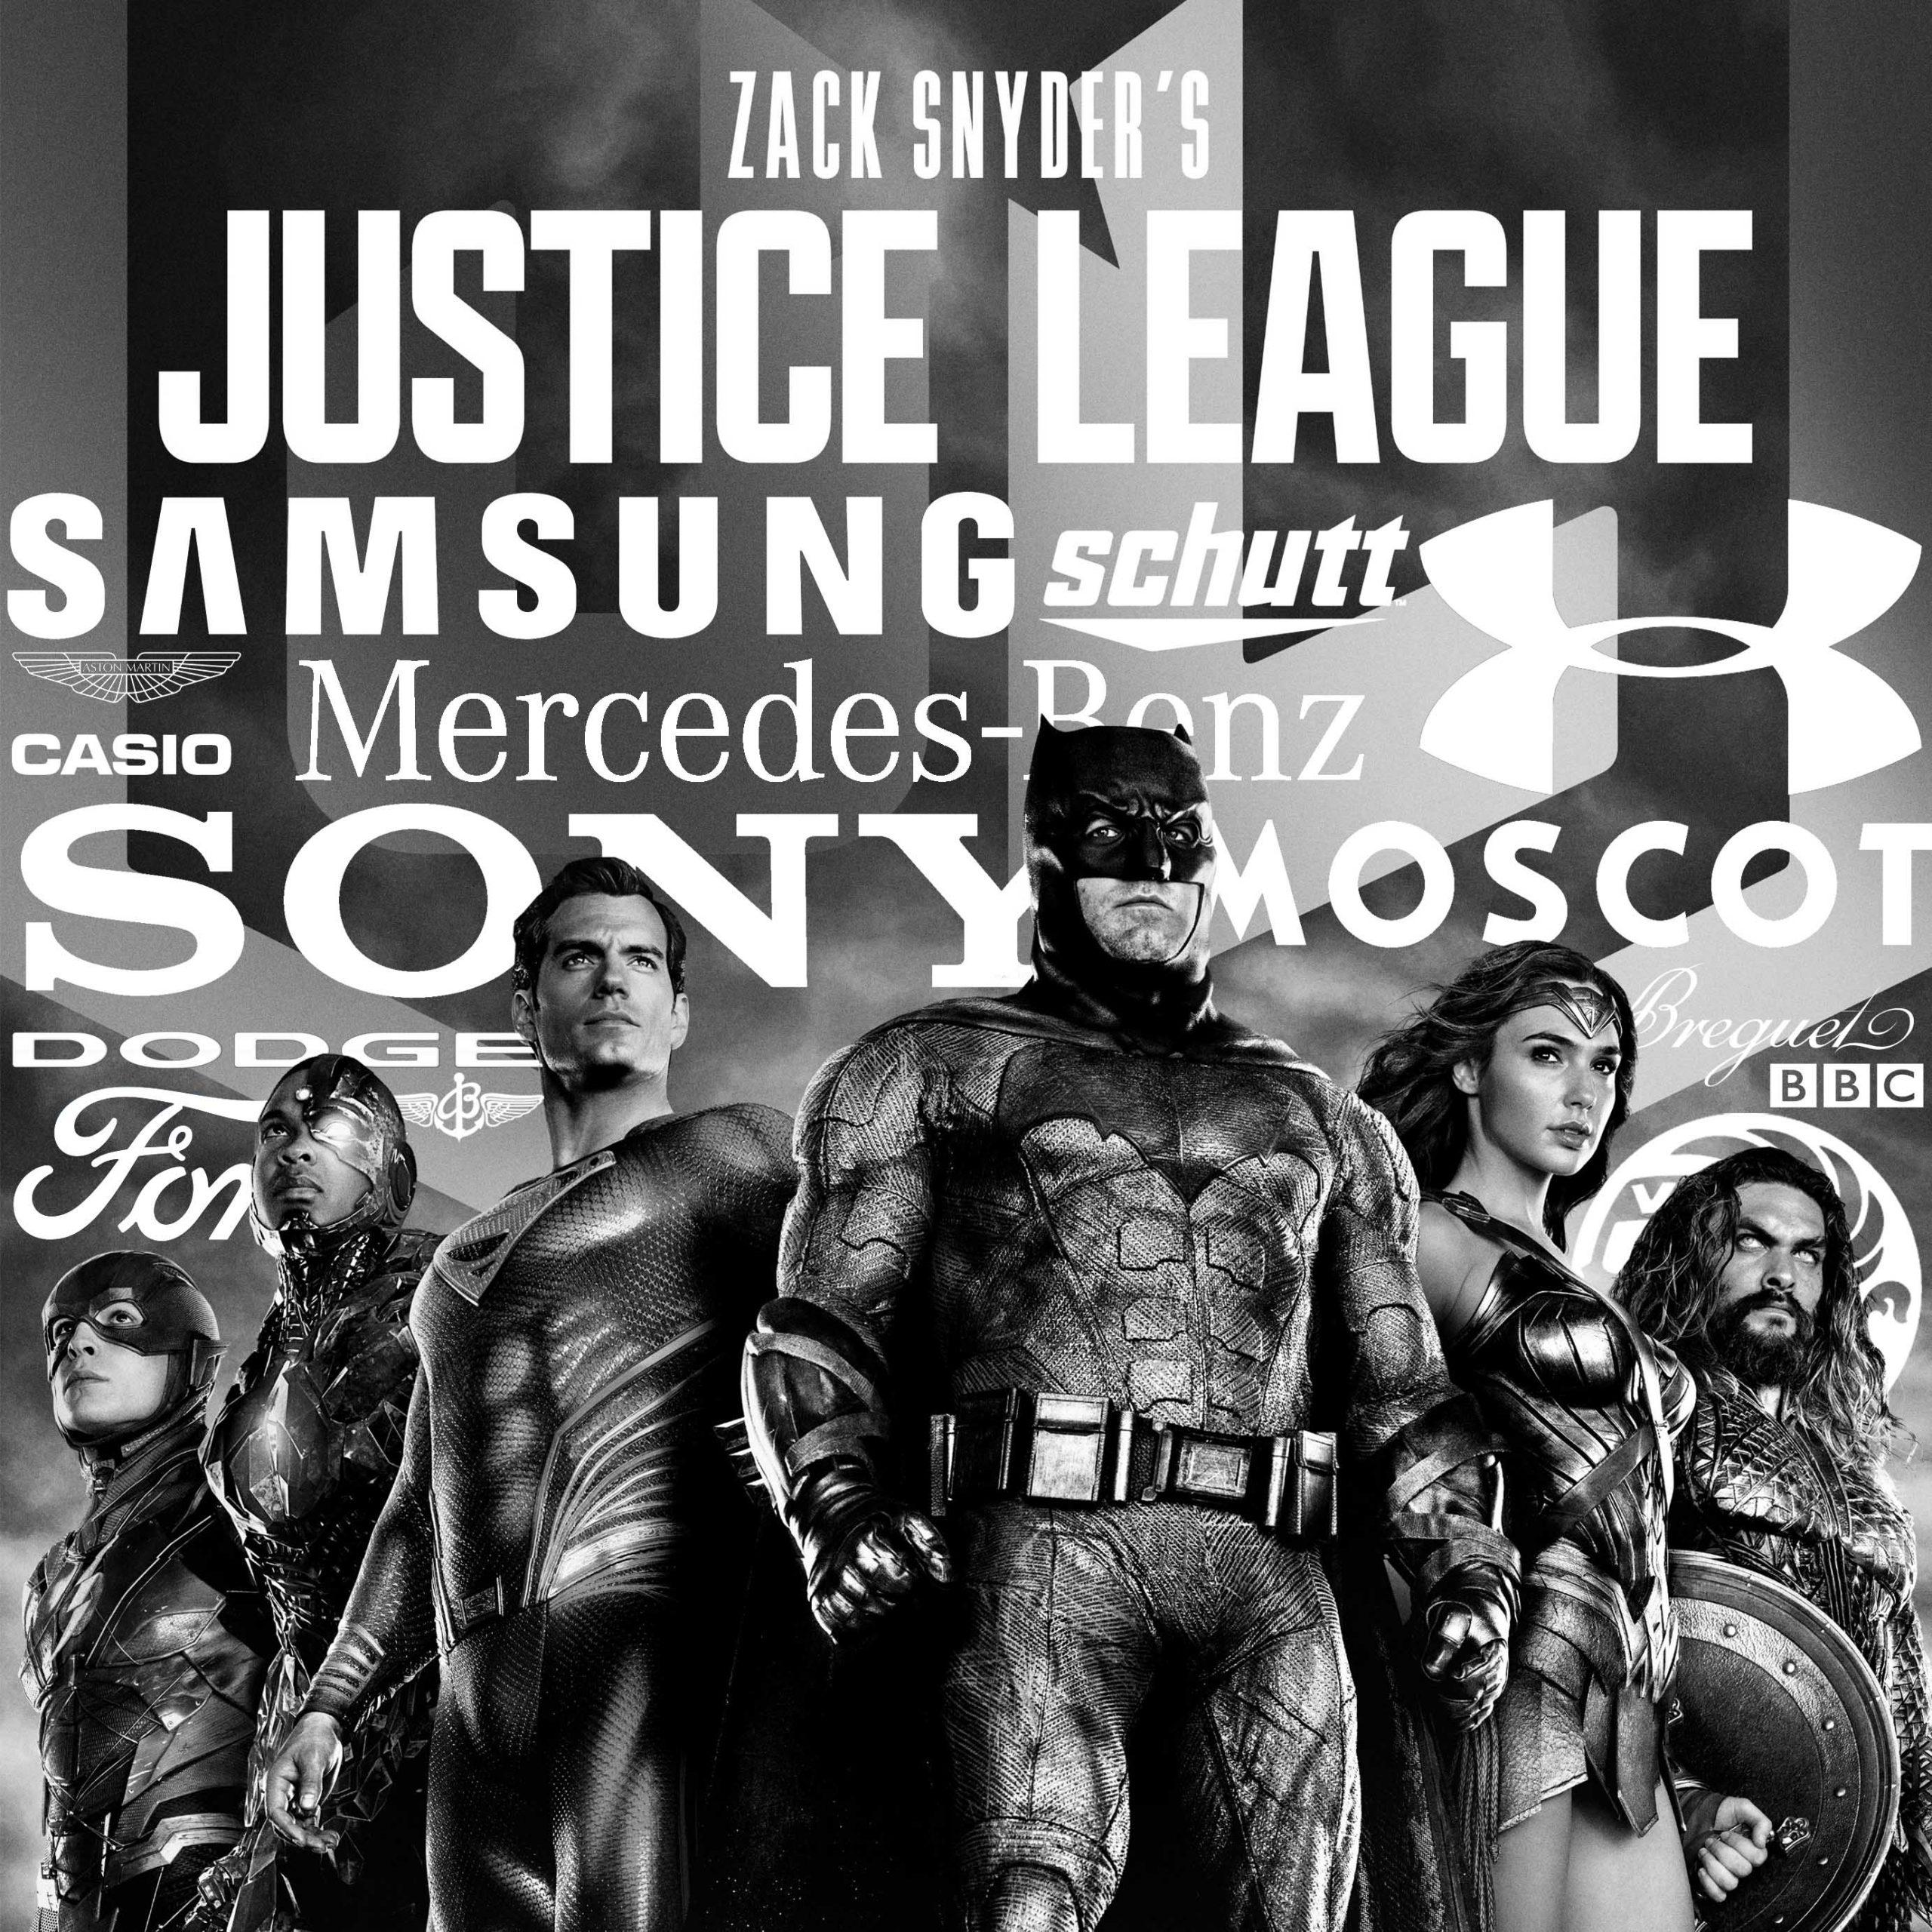 JUSTICE LEAGUE (2017) vs. SNYDER CUT product placement